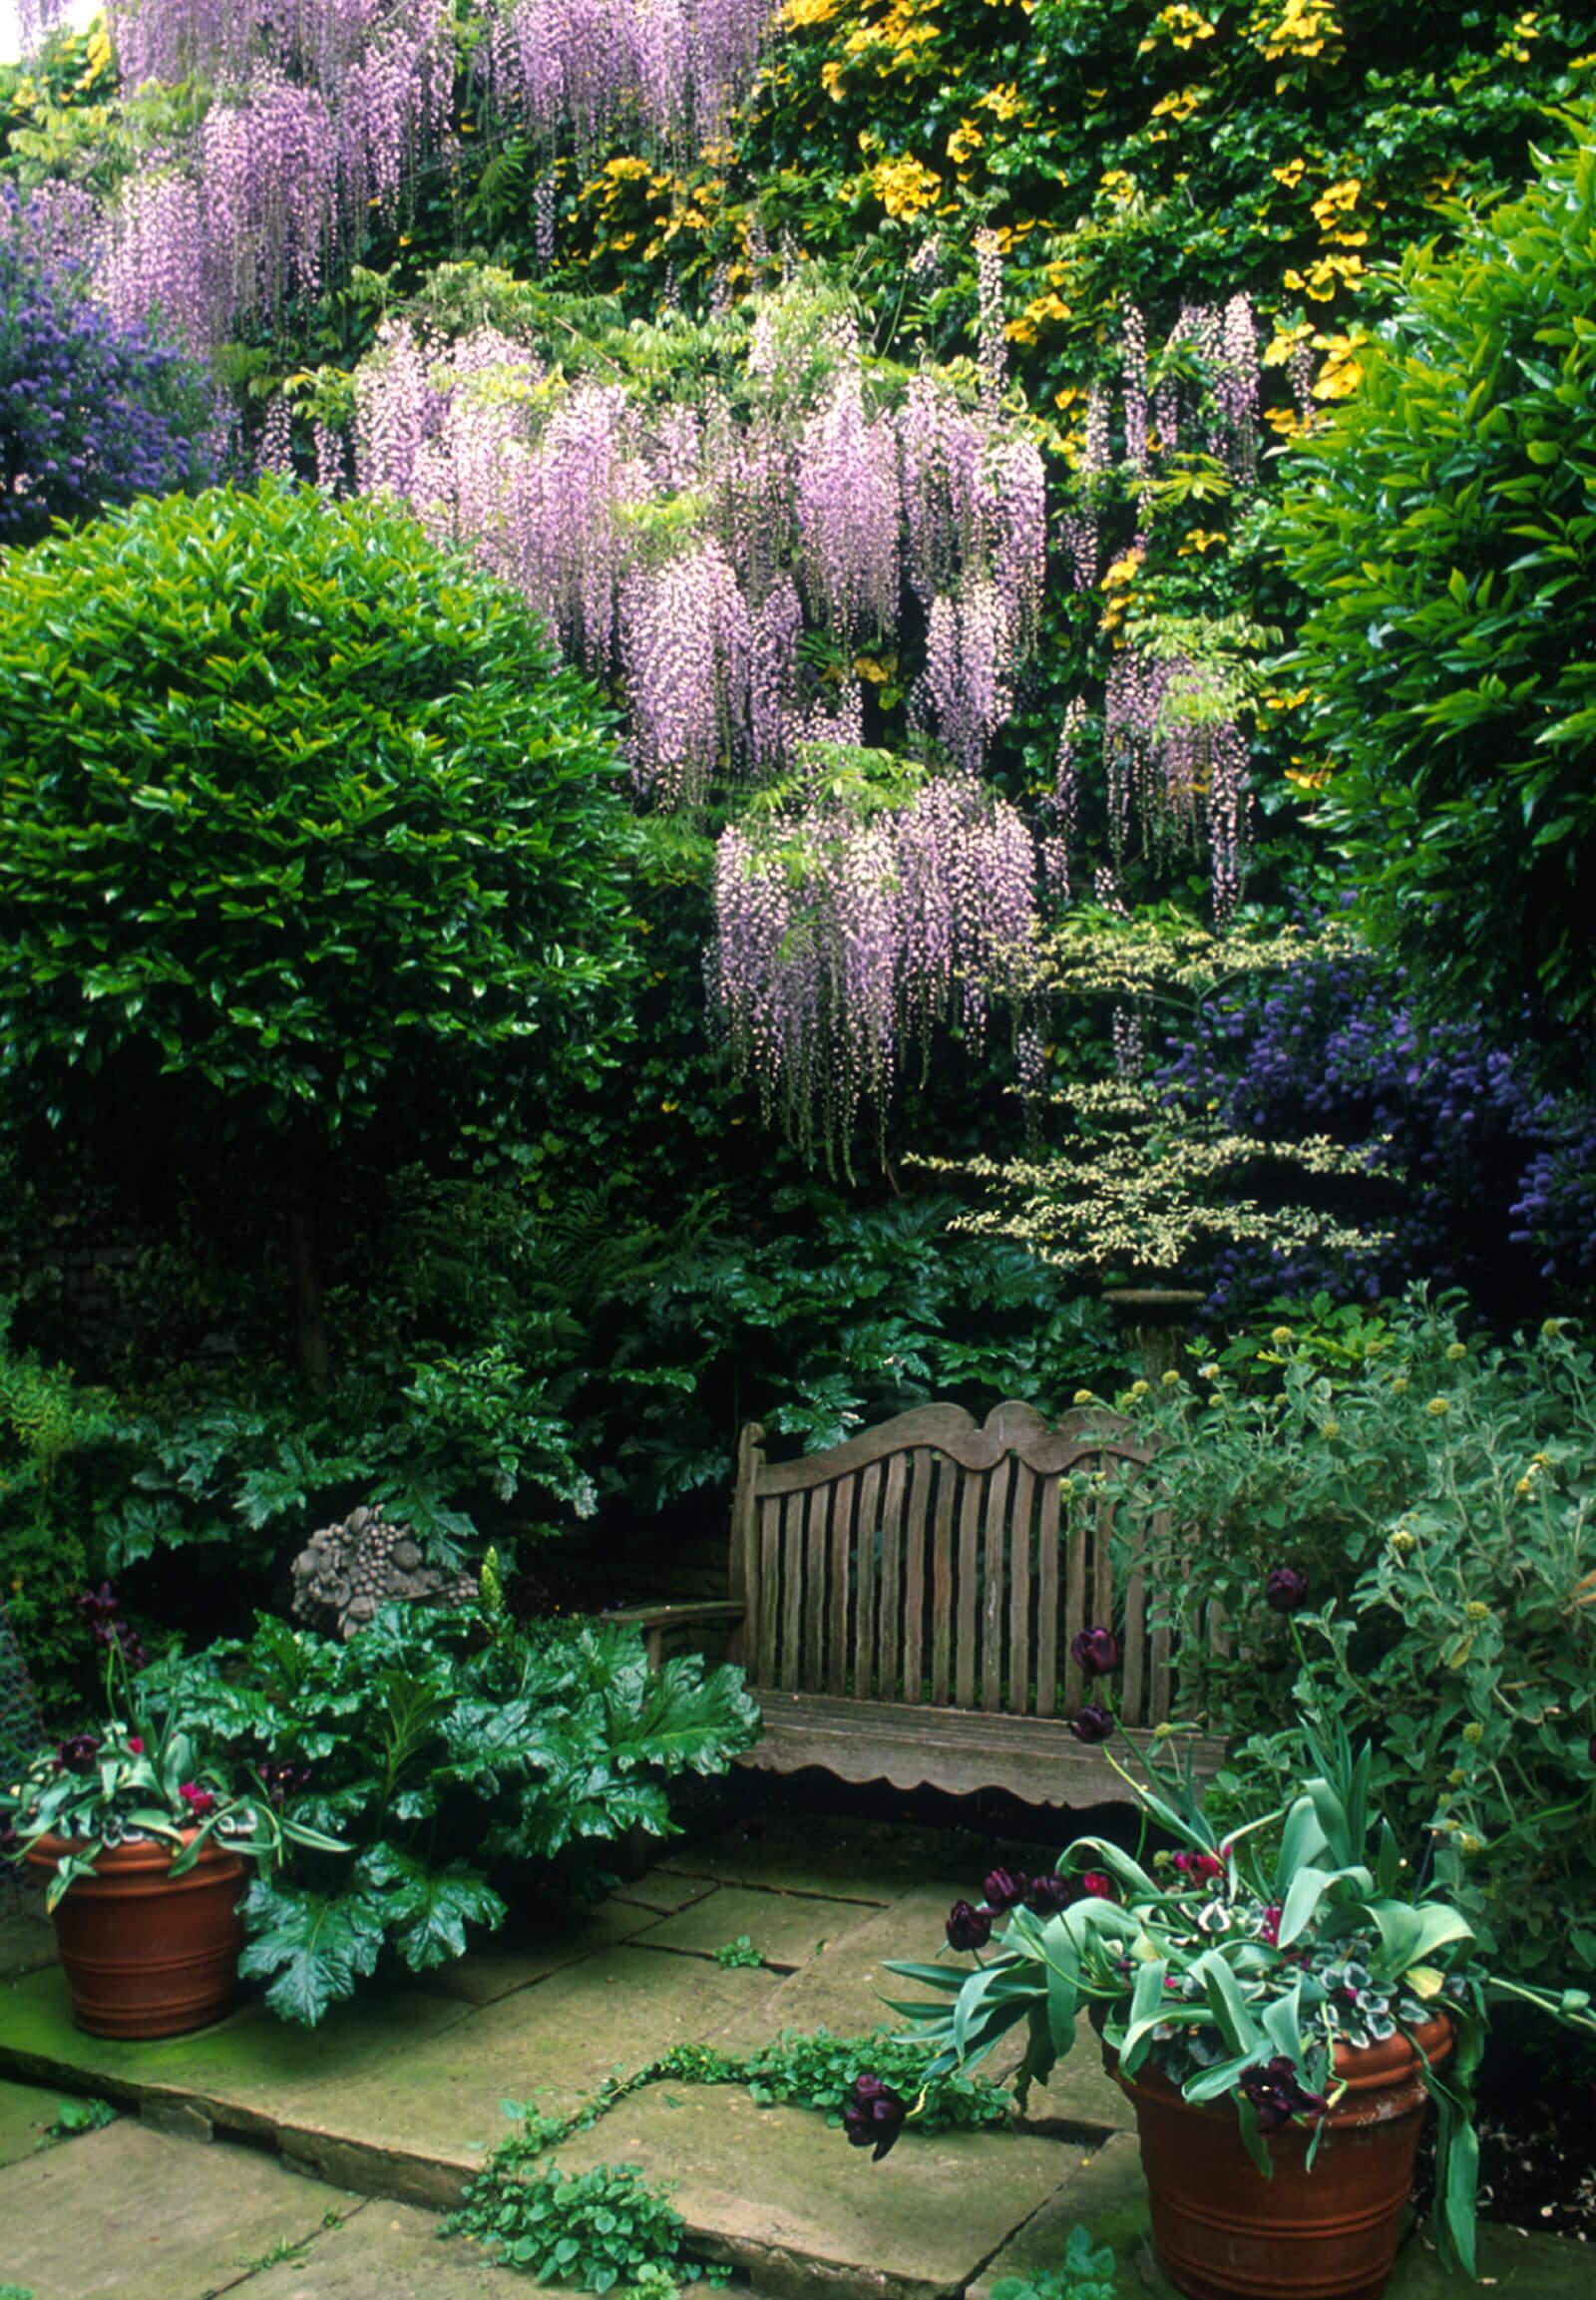 Garden in Pimlico, London